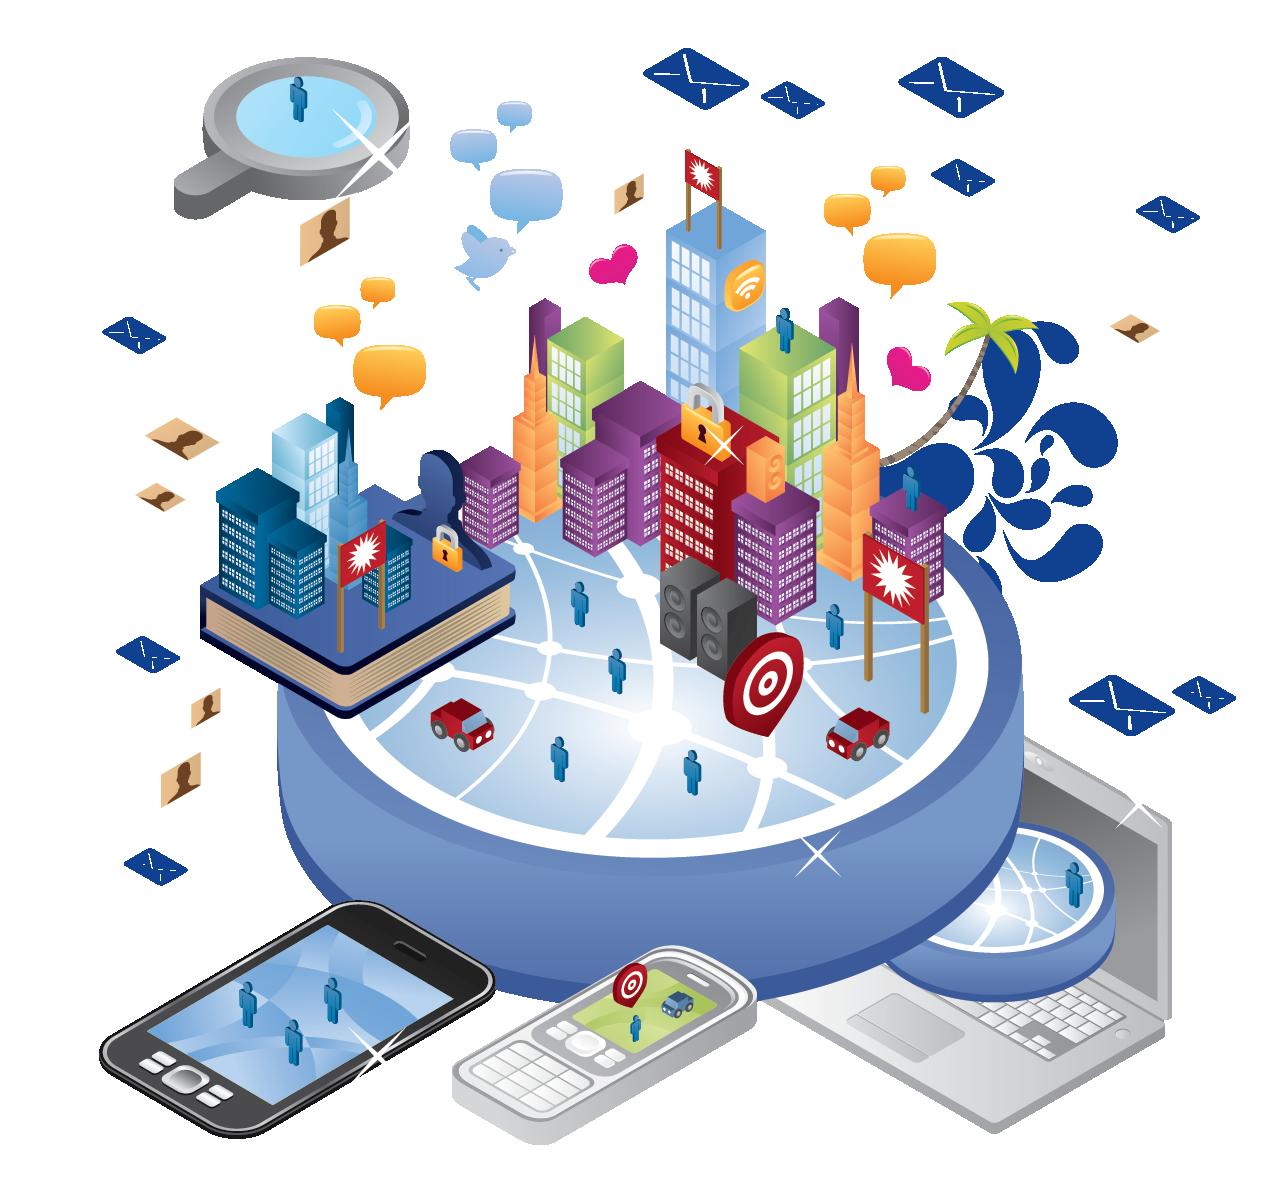 City clipart smart city. Summit registration financial tribune